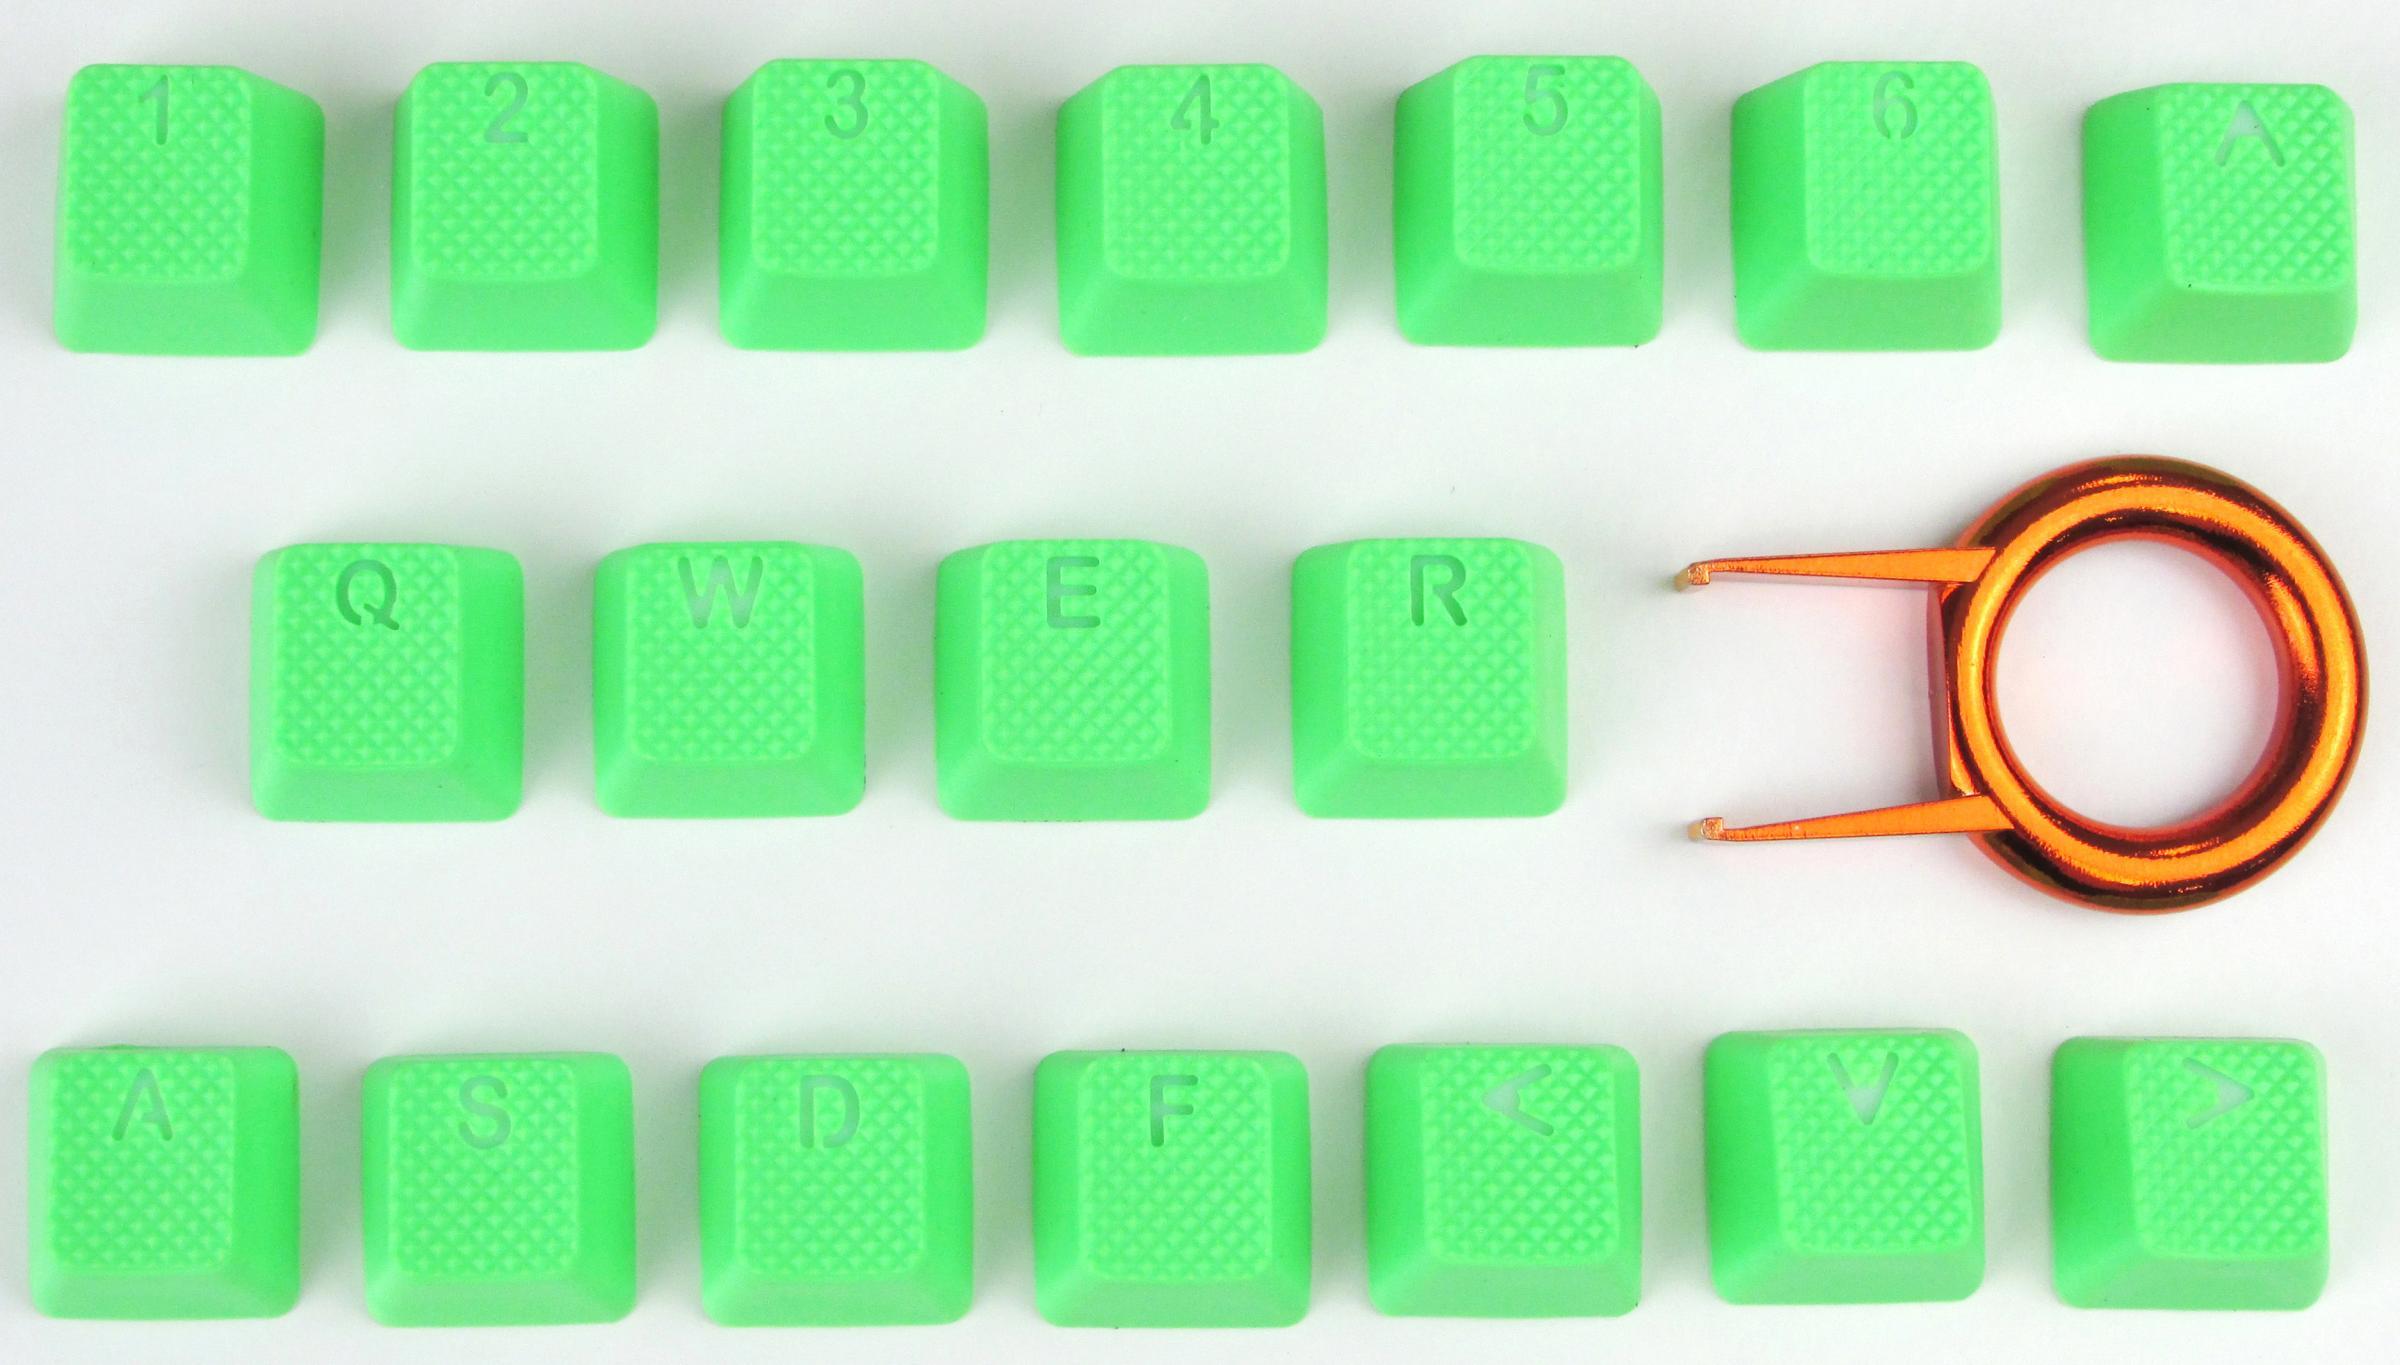 18-Key TPR Backlit Double Shot Keycap Set - Neon Green (Tai-Hao)